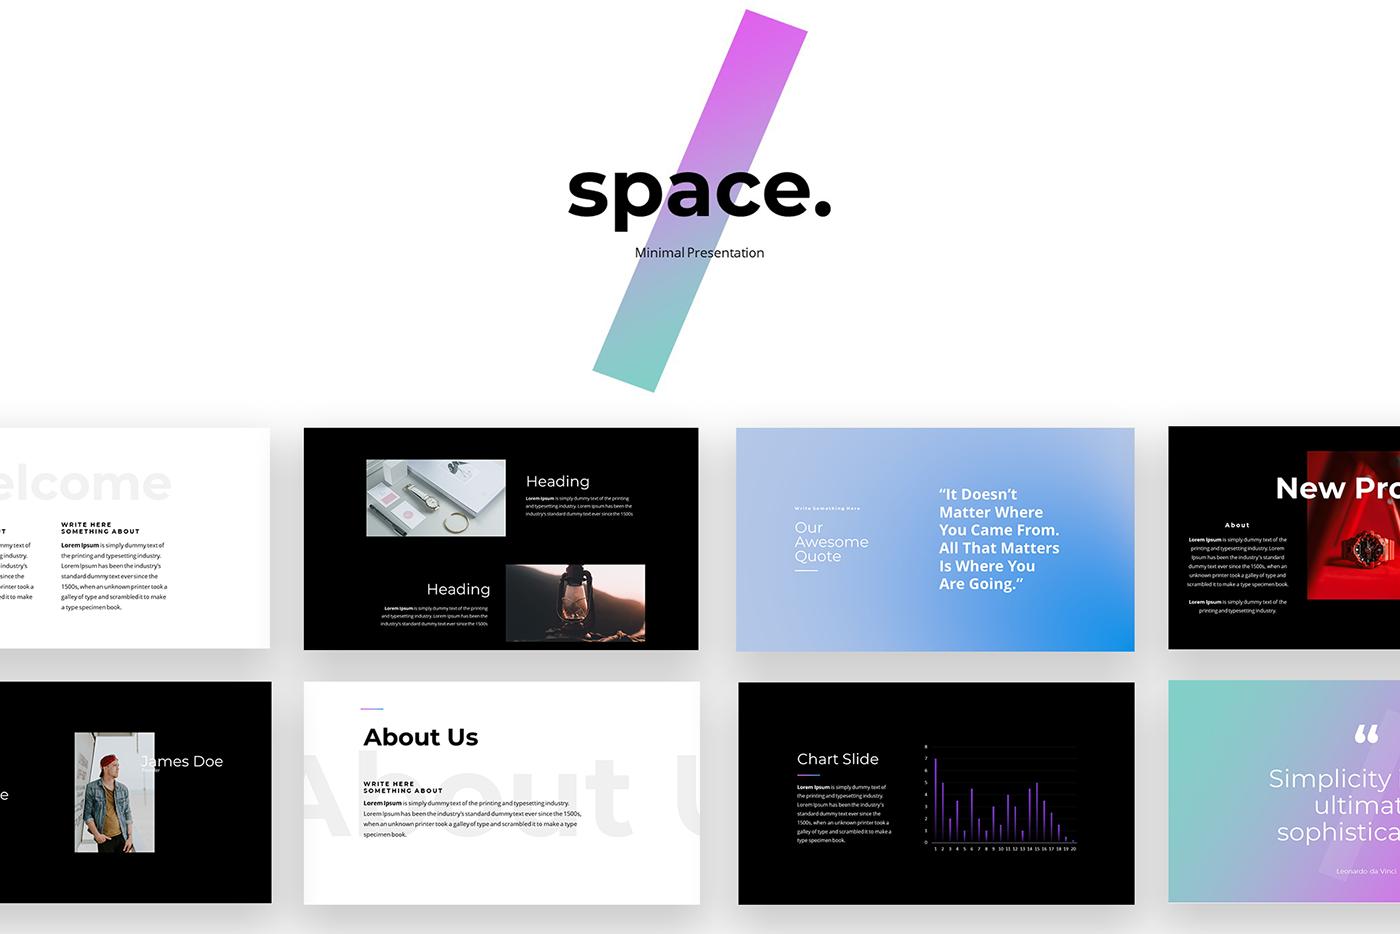 presentation Powerpoint PPT minimal space powerpoint Space  miniaml presentation minimal ppt modern adobeawards